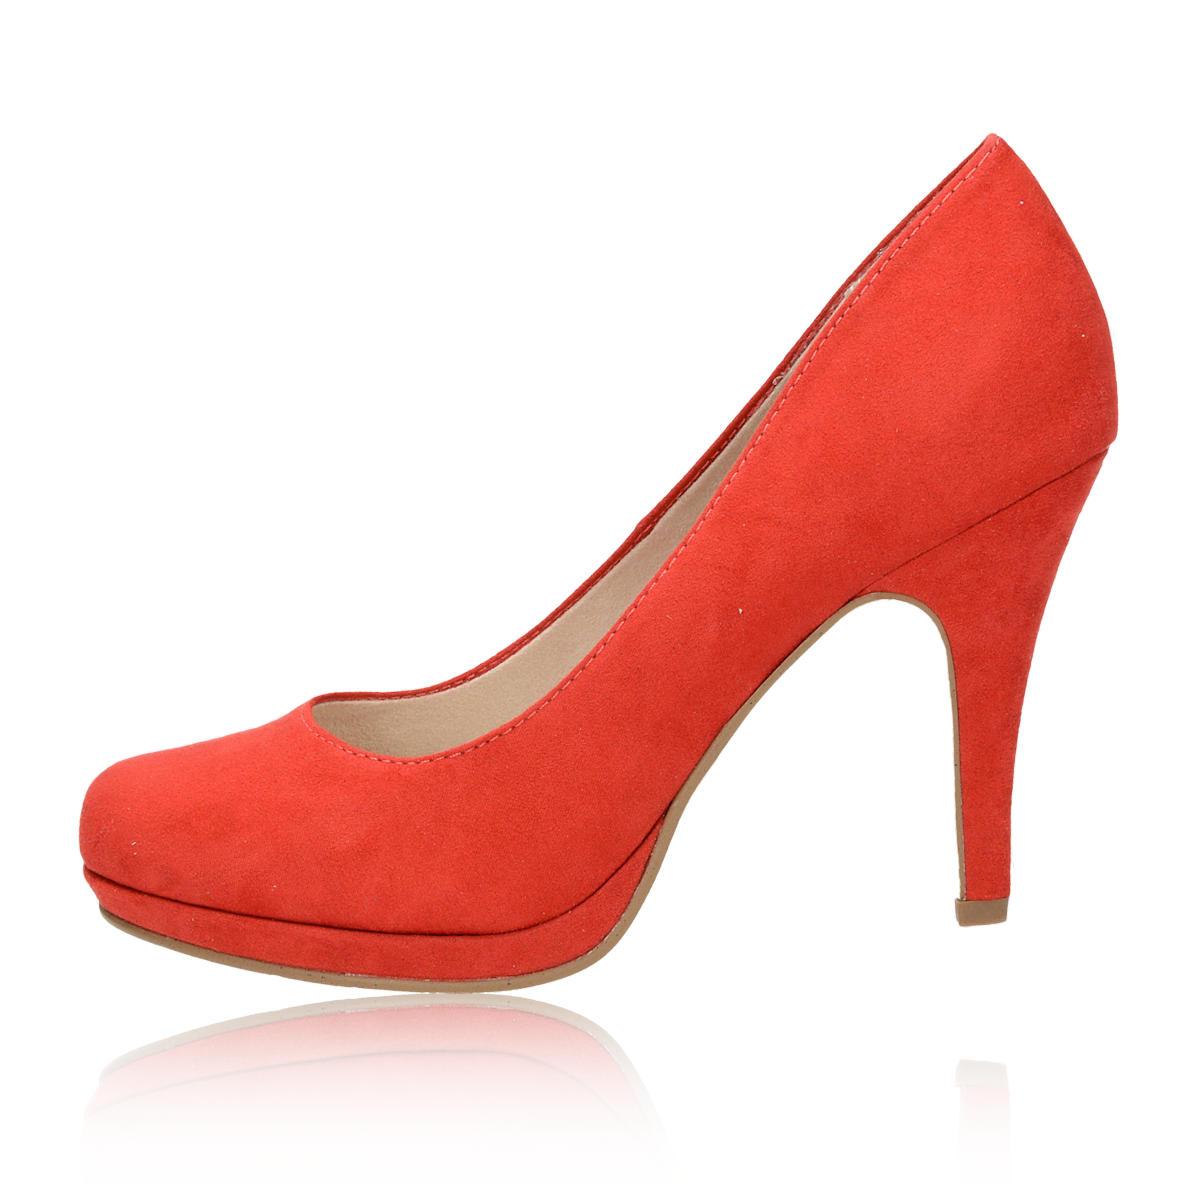 Tamaris dámske lodičky - červené Tamaris dámske lodičky - červené ... d0313b6372